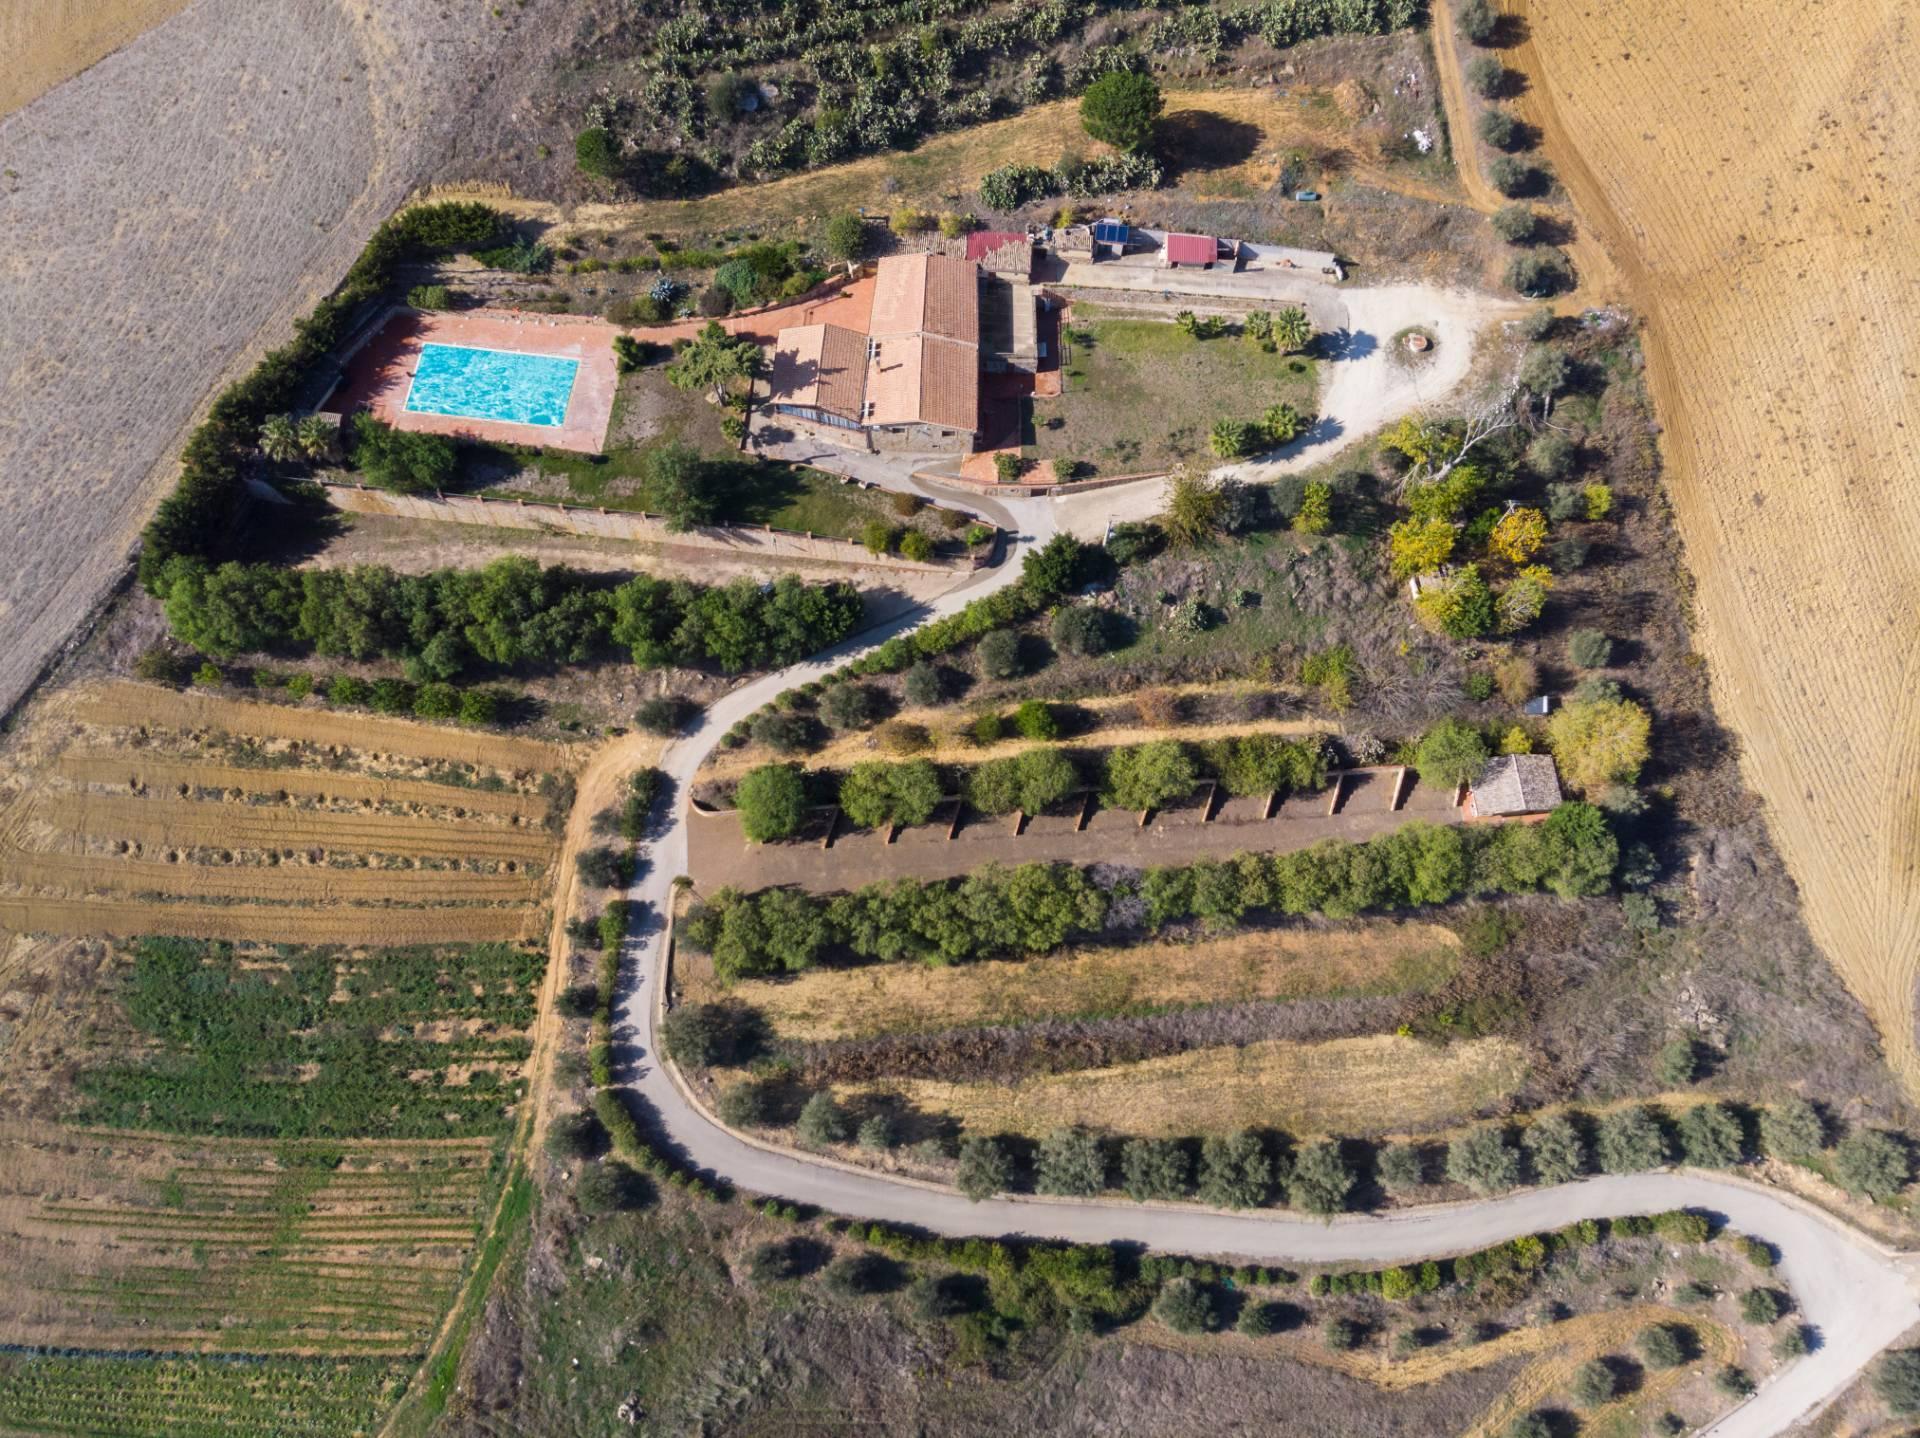 Villa in Vendita a Piazza Armerina: 5 locali, 550 mq - Foto 19